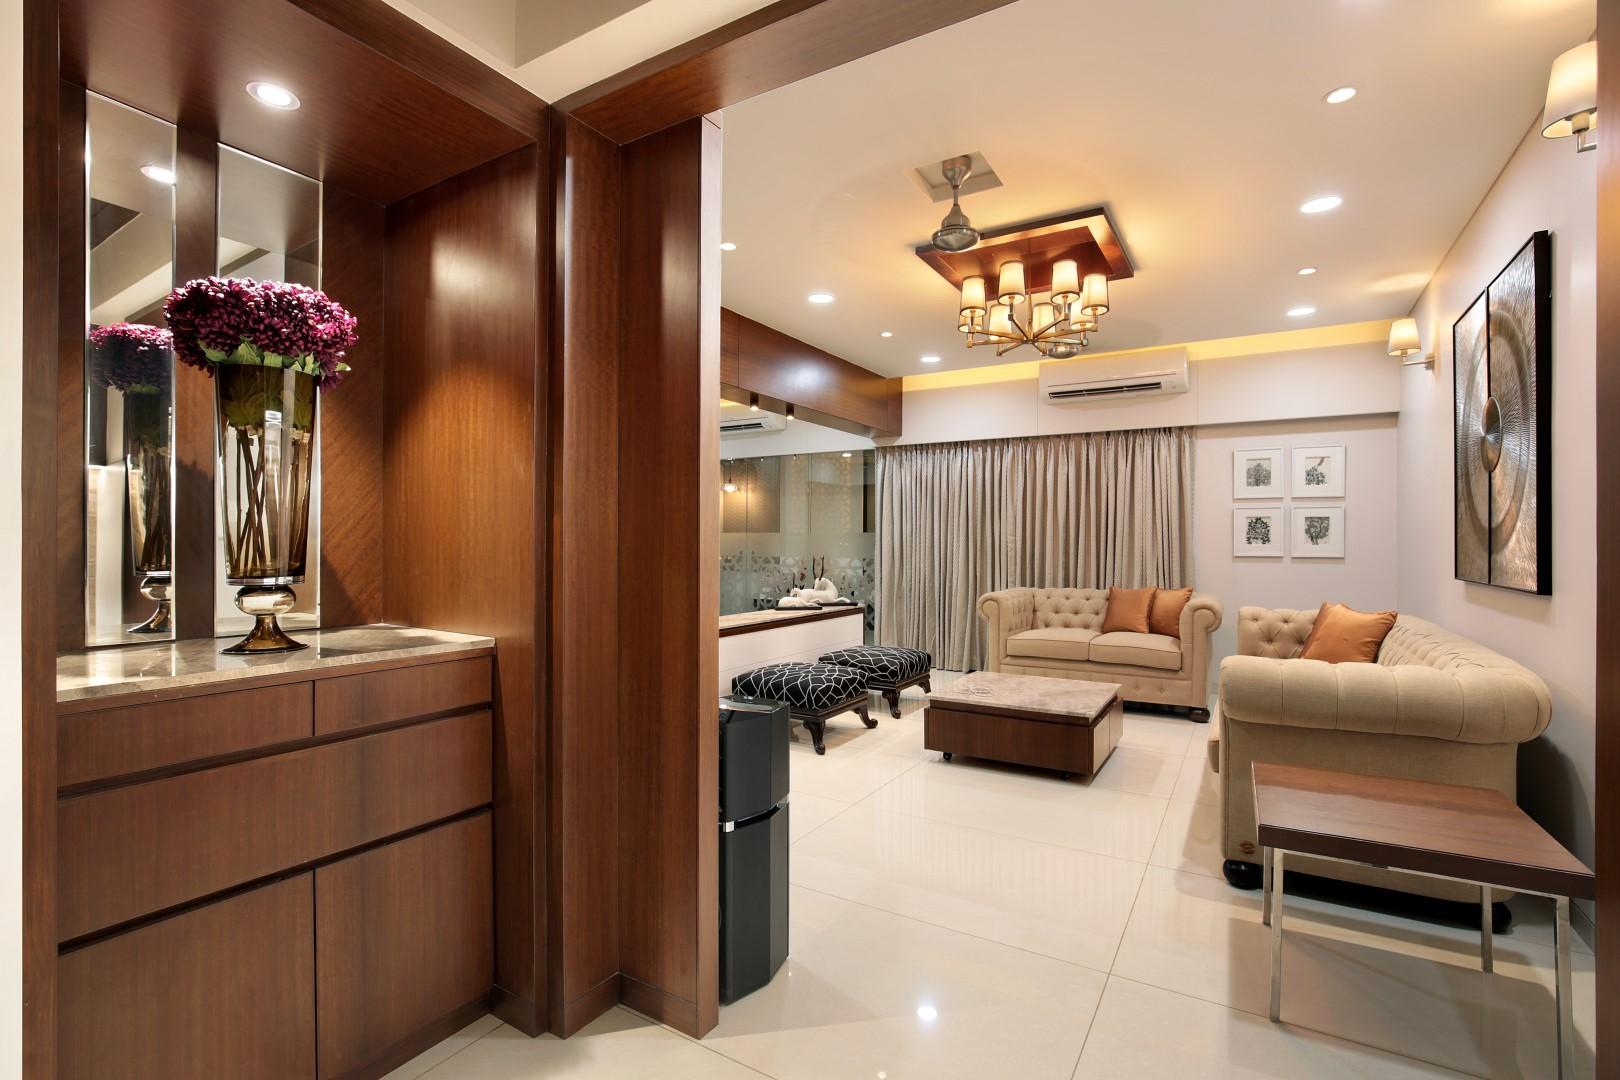 3 Bhk Flat Interiors The Oak Woods Vadodara Studio7 The Architects Diary